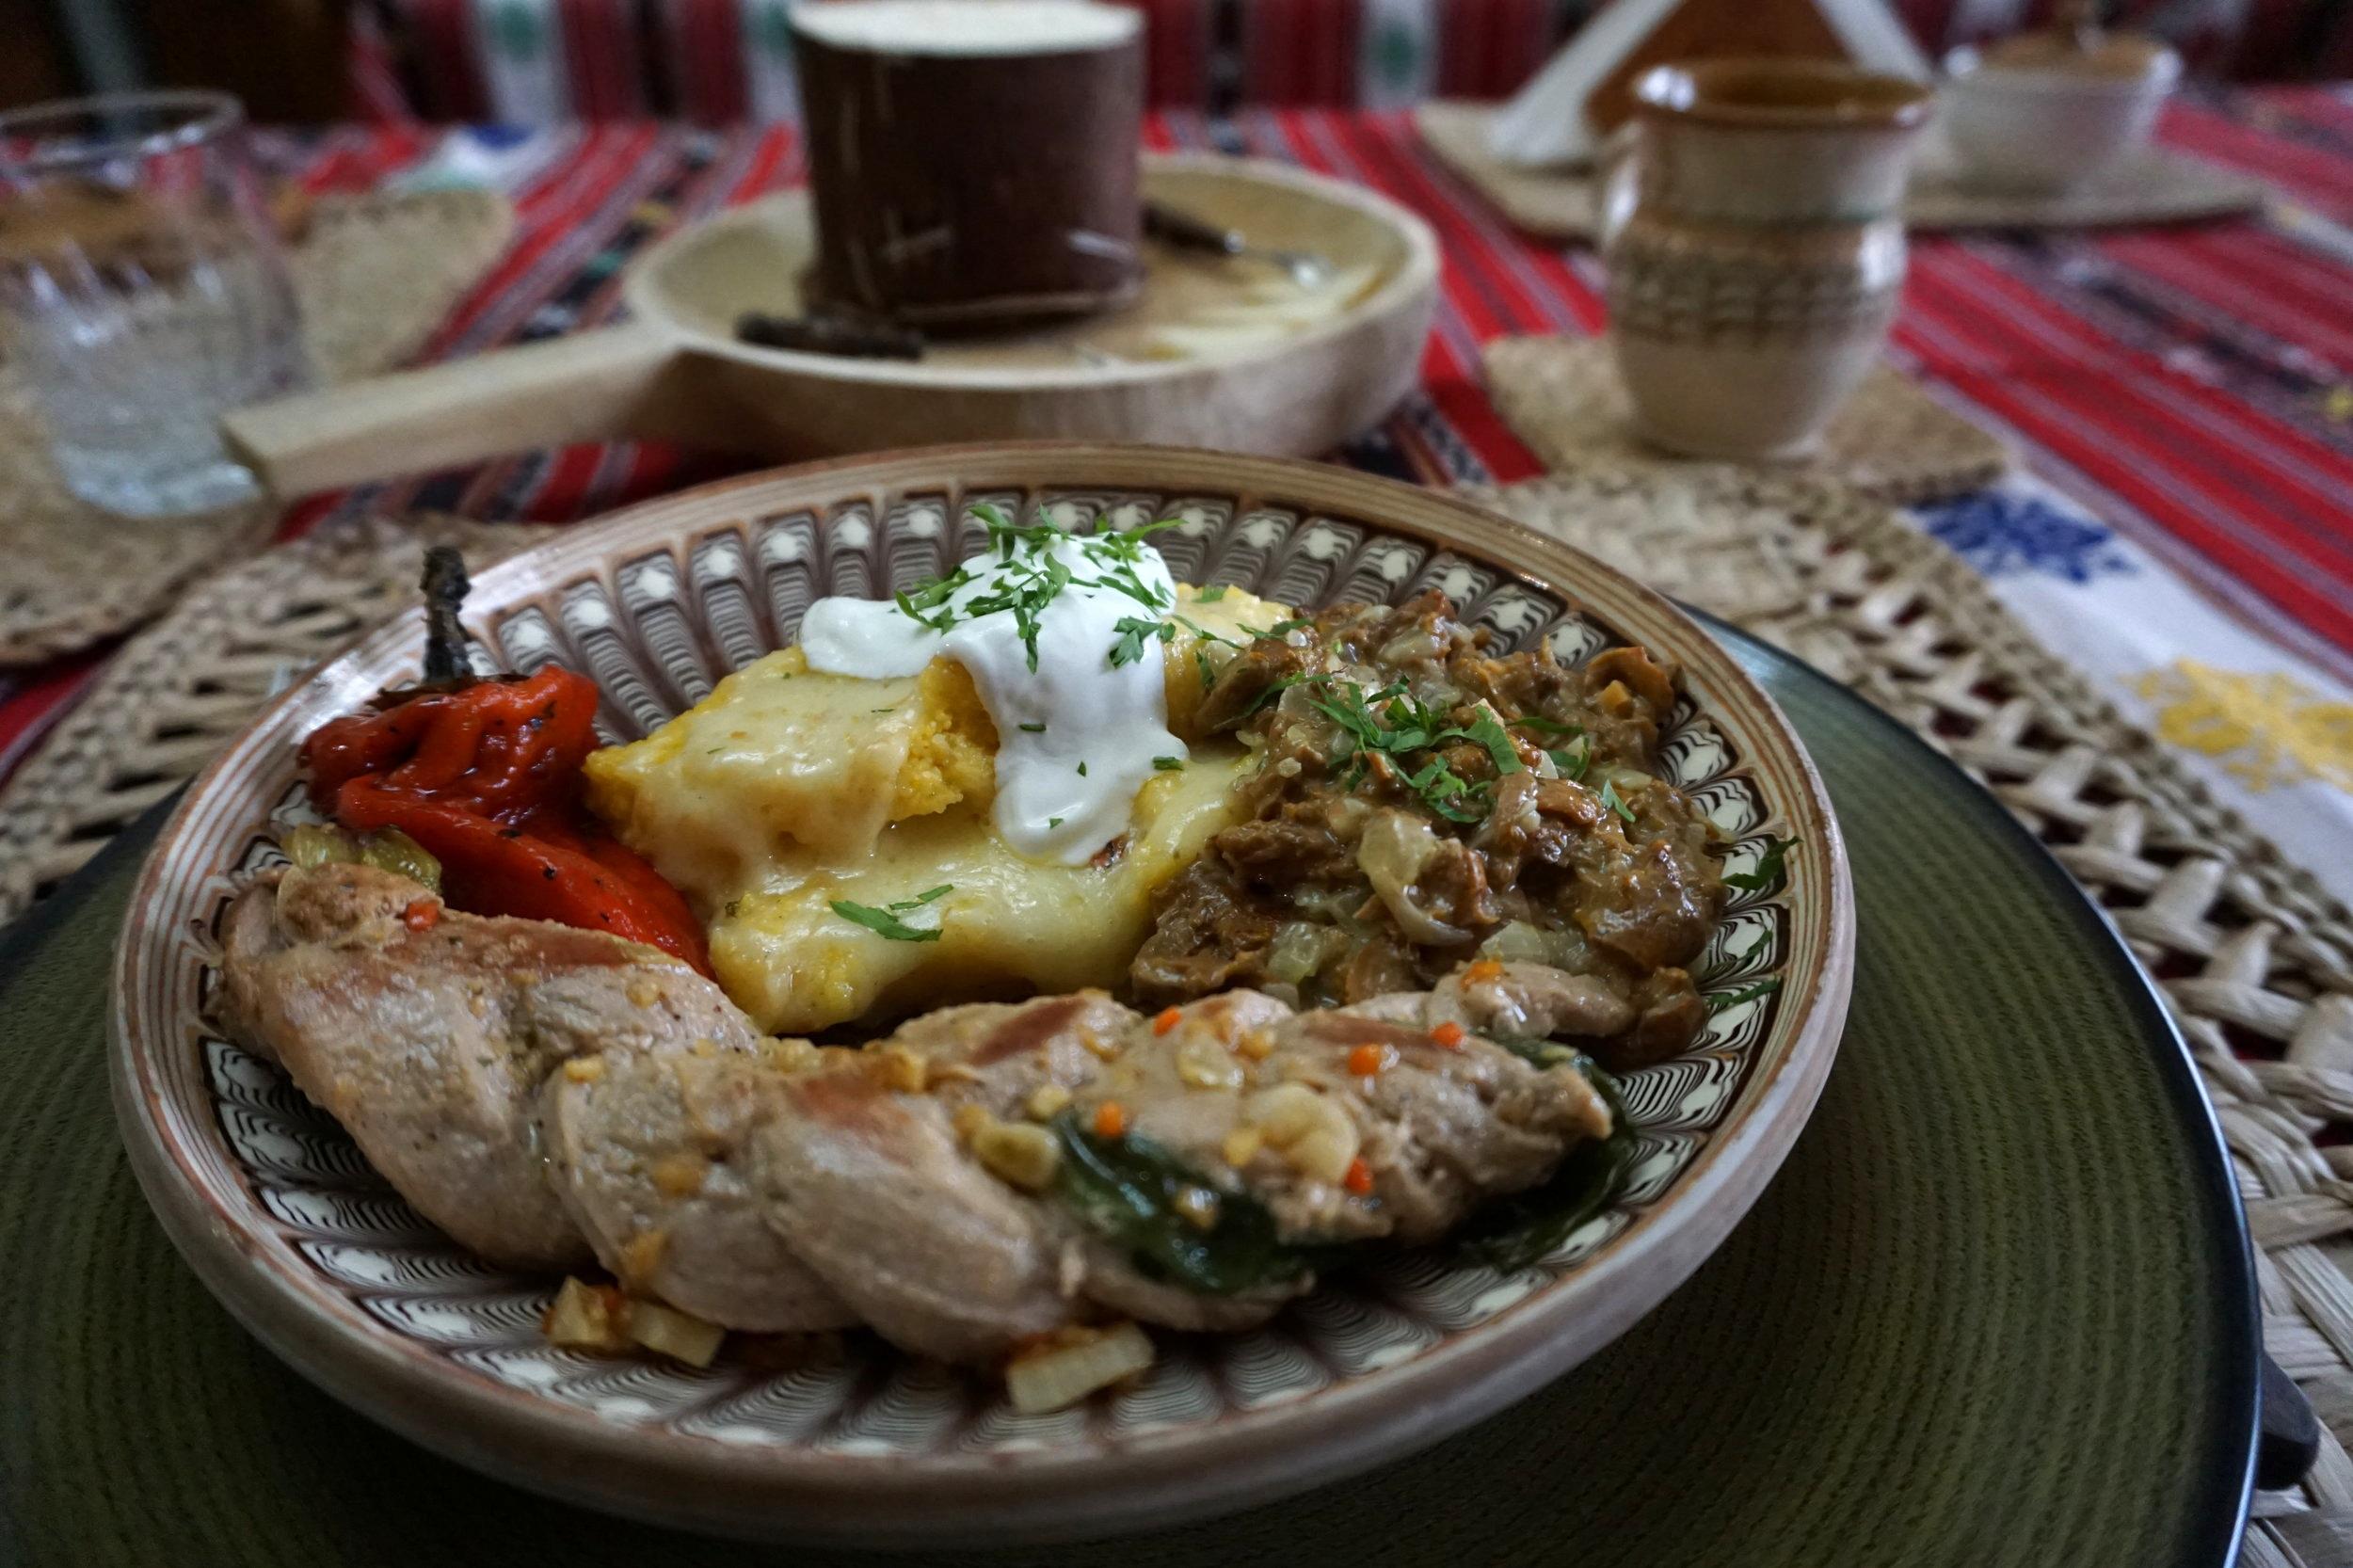 Romanian main dish: roasted pork, polenta, wild mushrooms and baked bell paper.